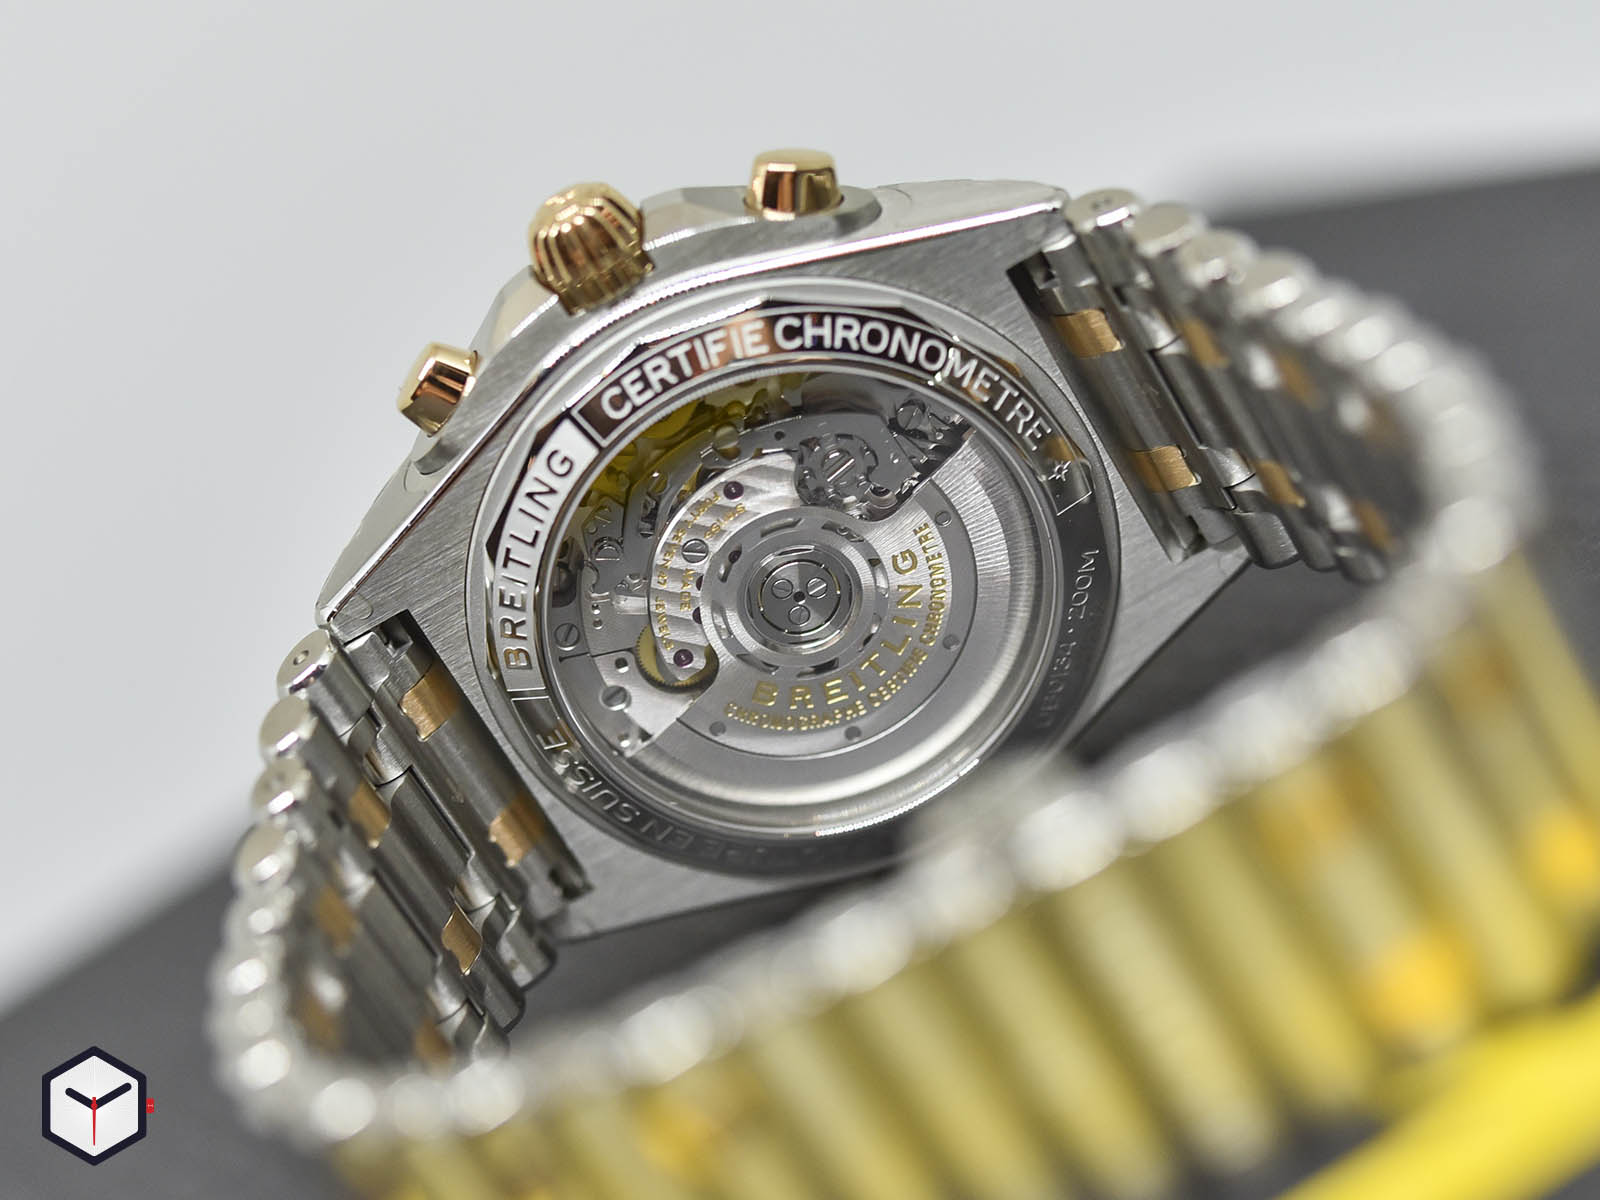 ub0134101b1u1-breitling-chronomat-chronograph-b01-42-5.jpg